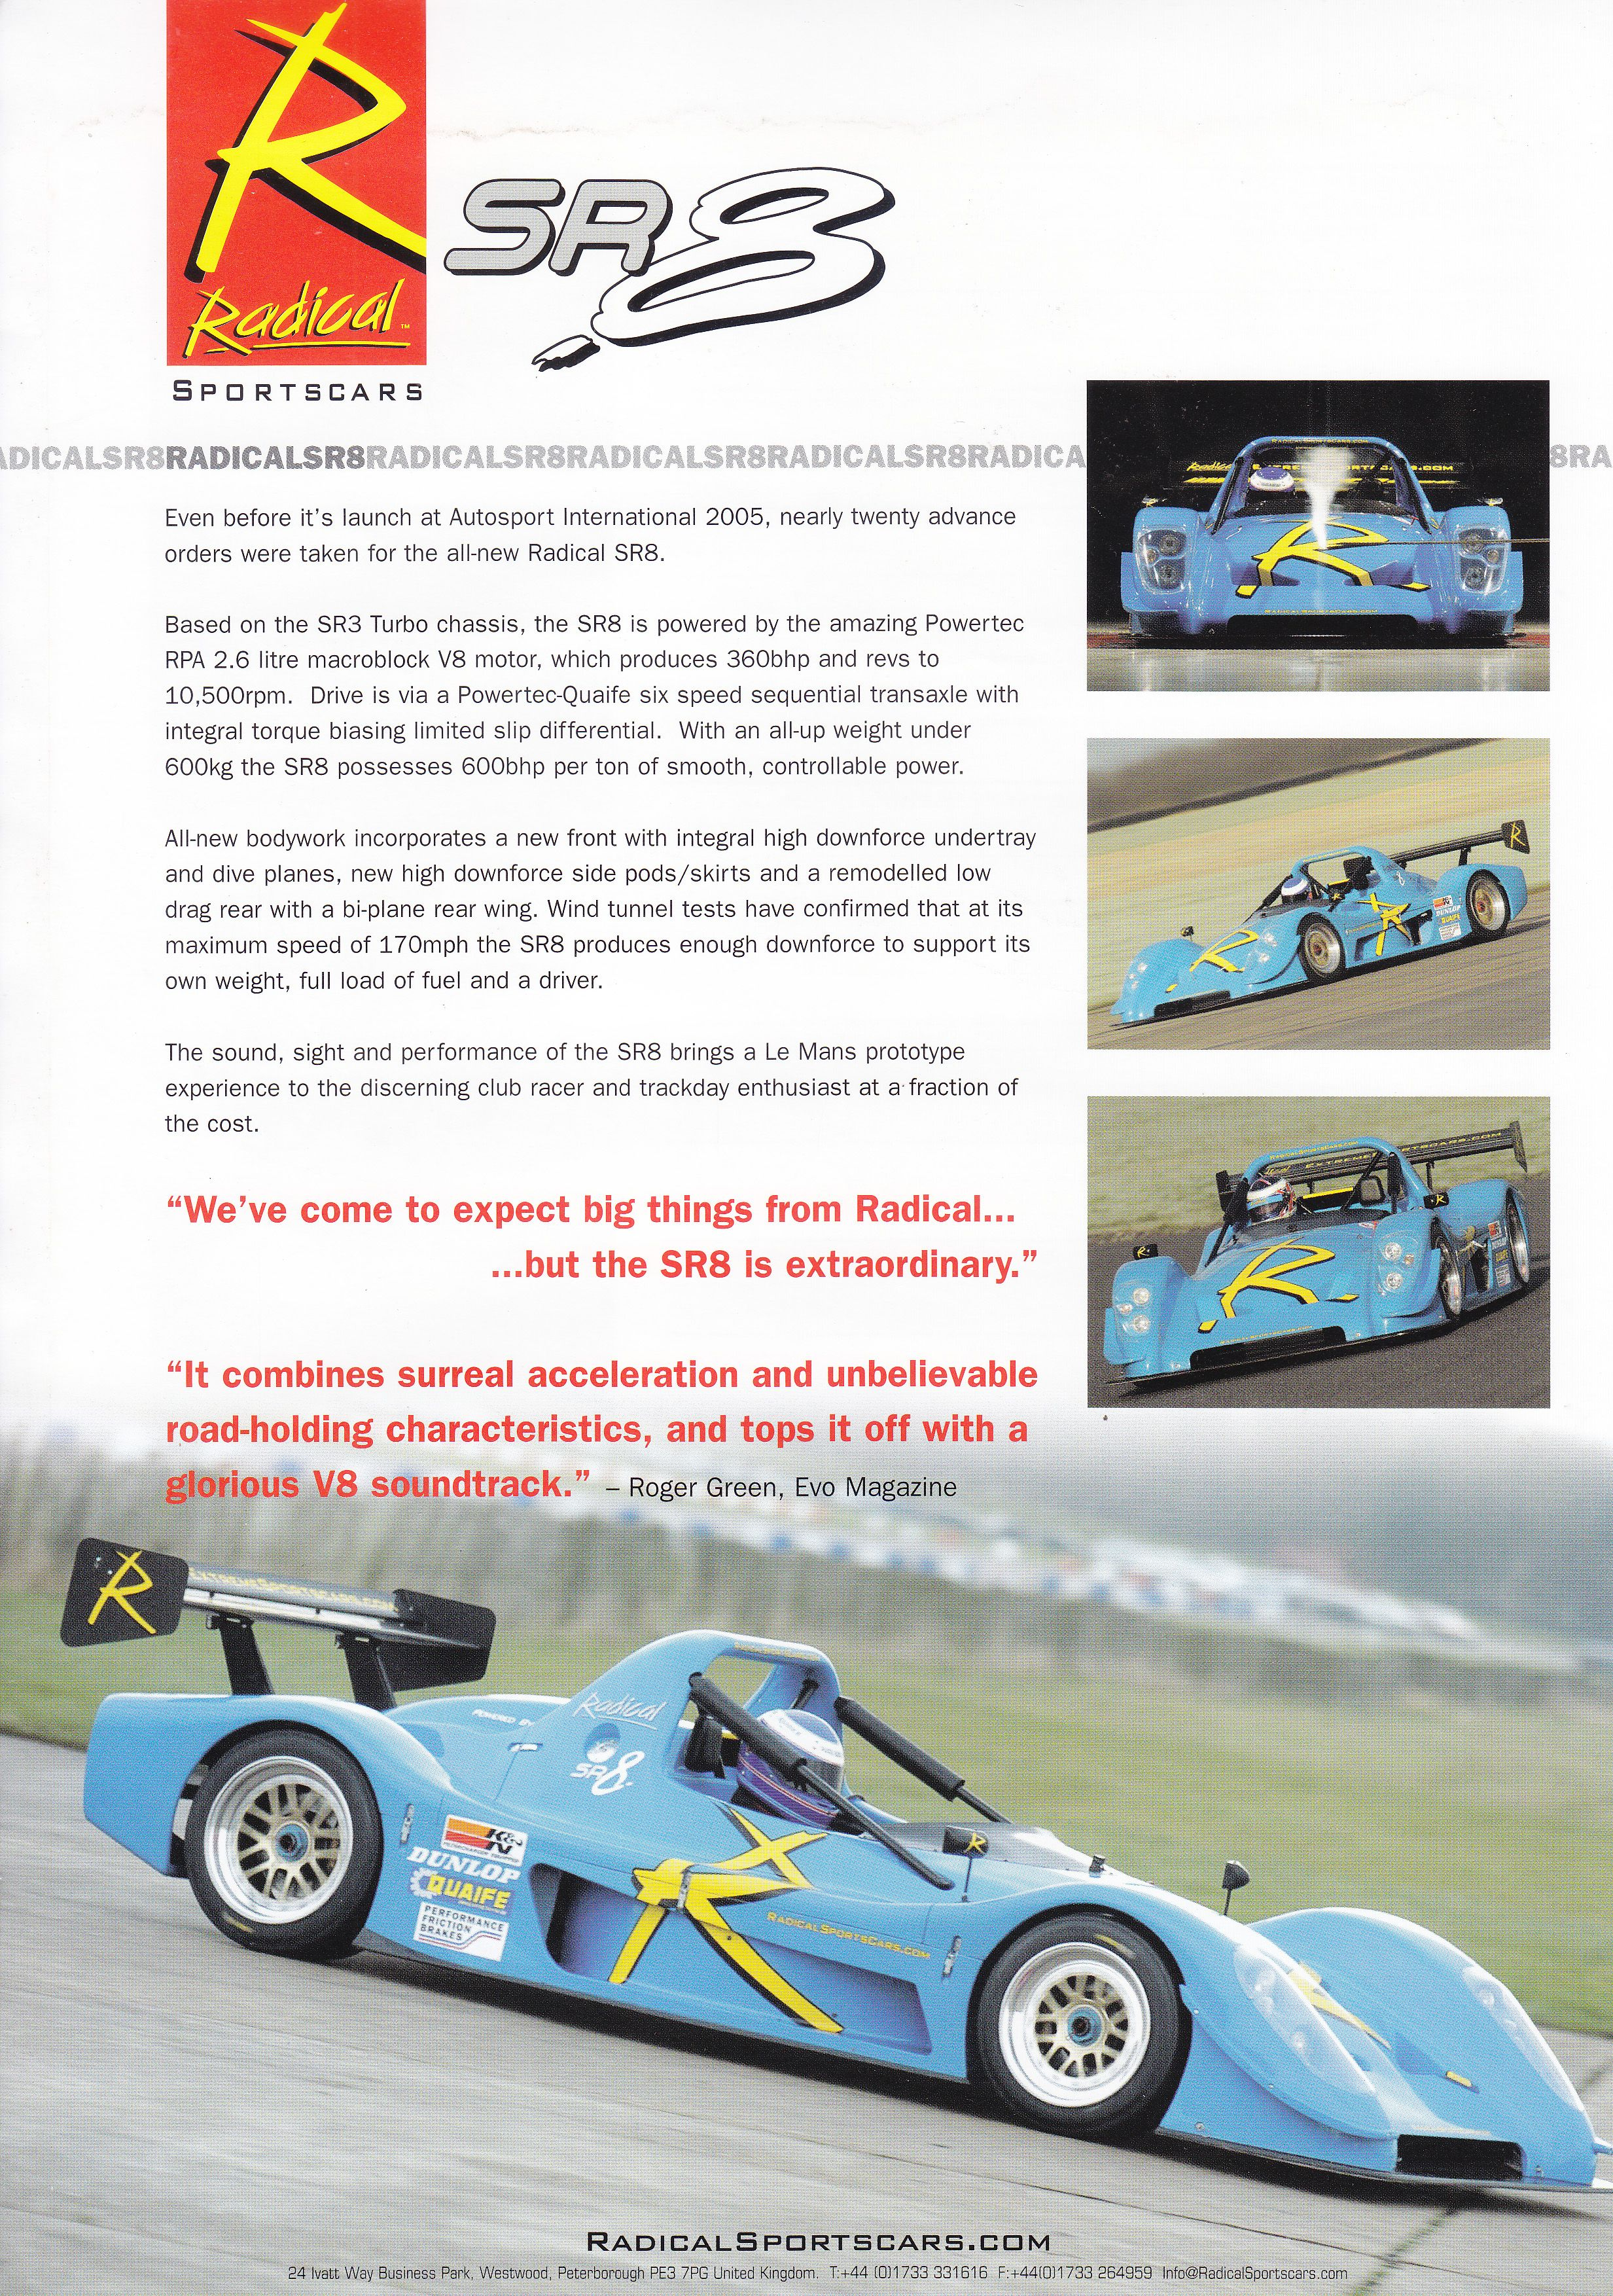 Radical SR8 track car (2005, UK, English leaflet)   Car sales